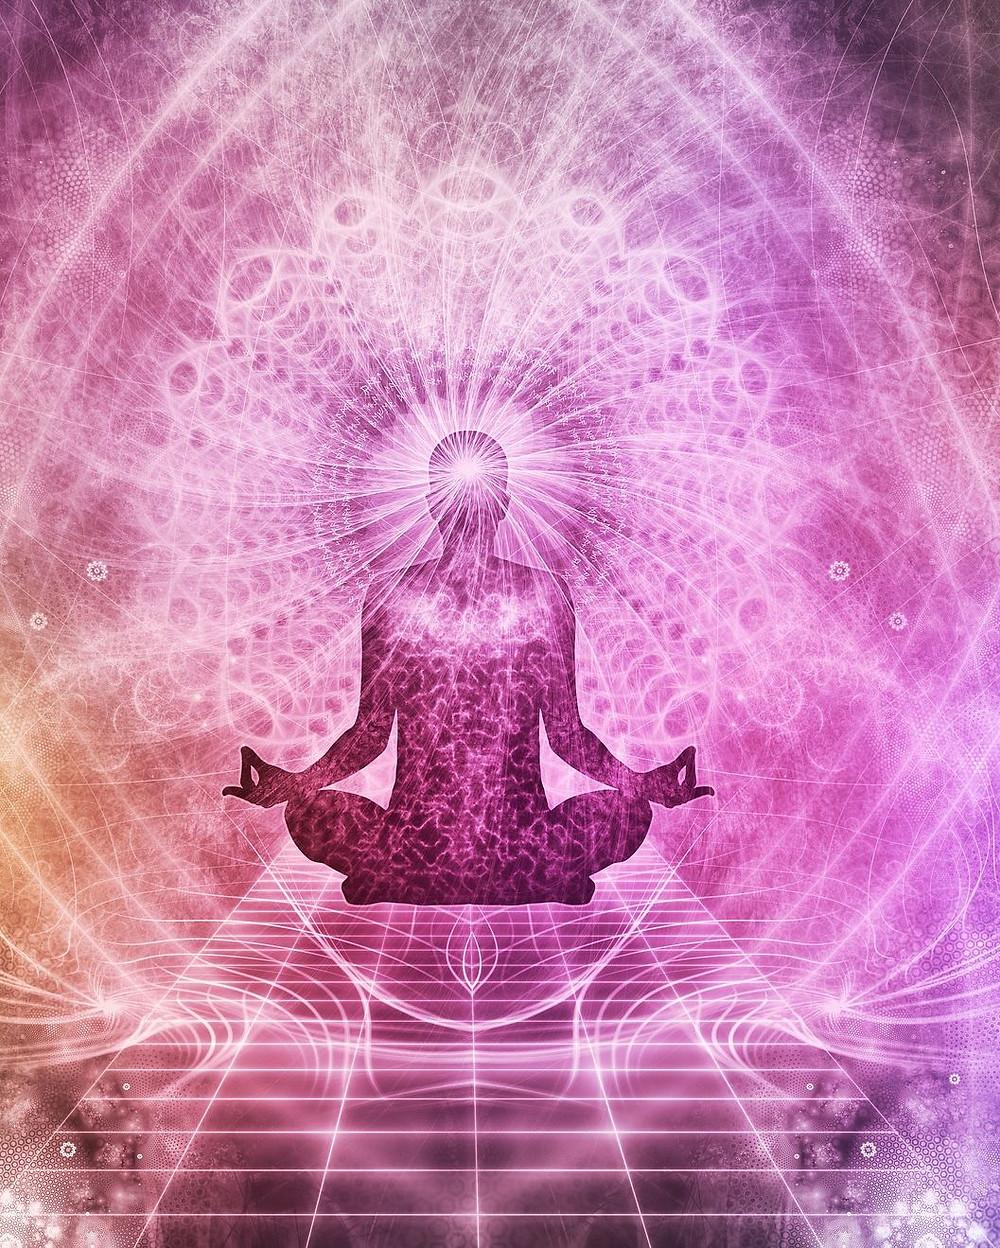 Subtle energy field surrounding body